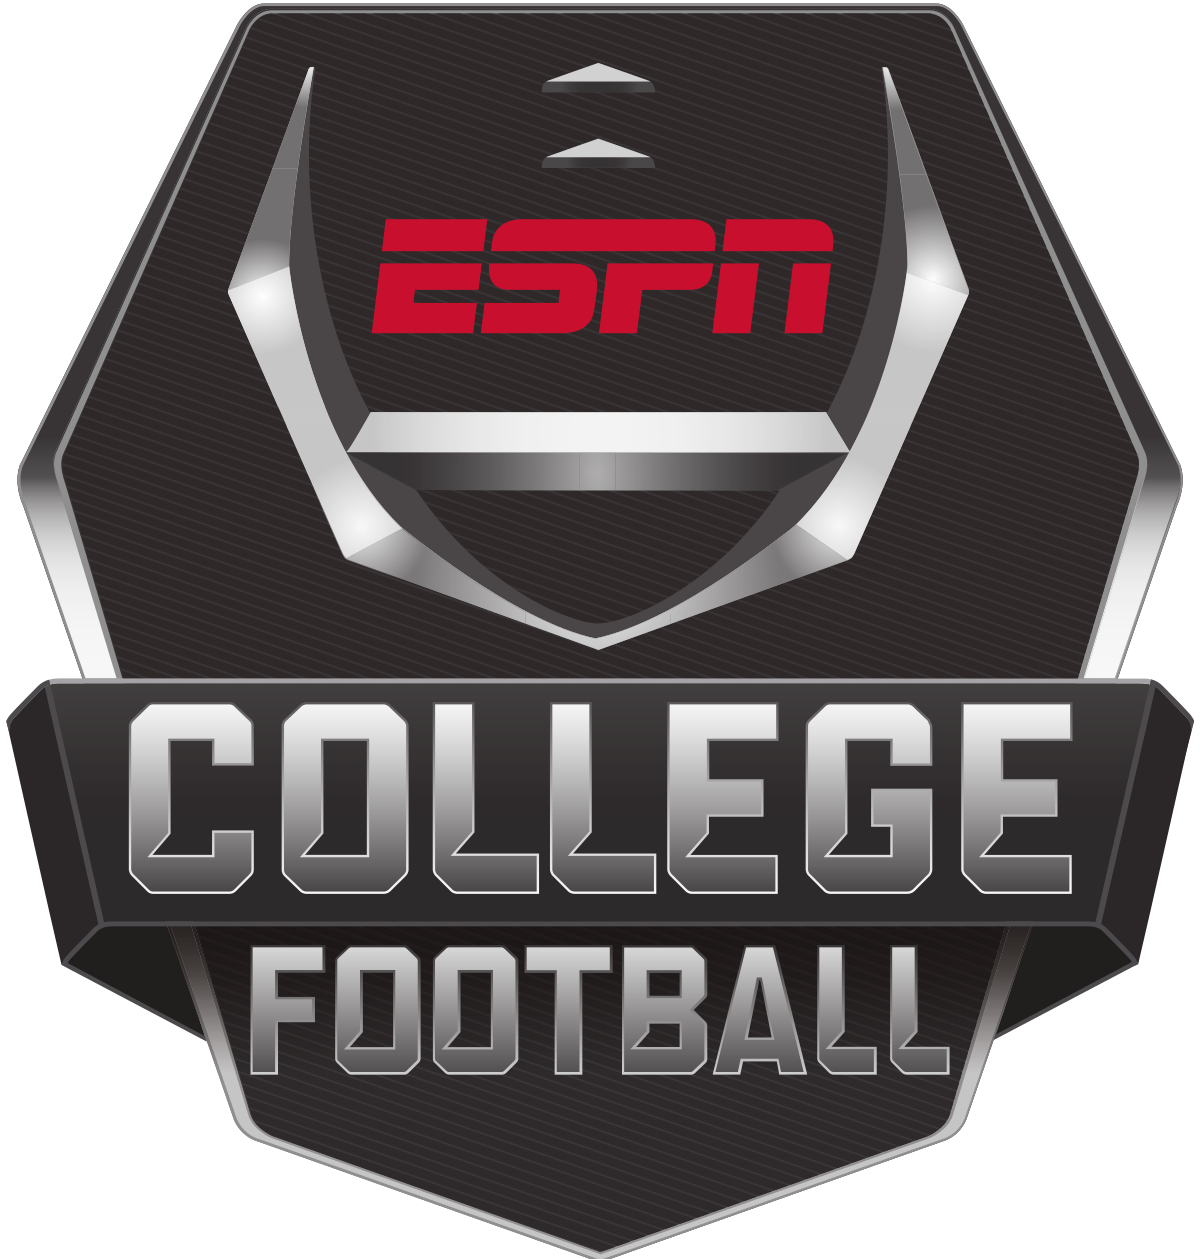 ESPN College Football on ABC.